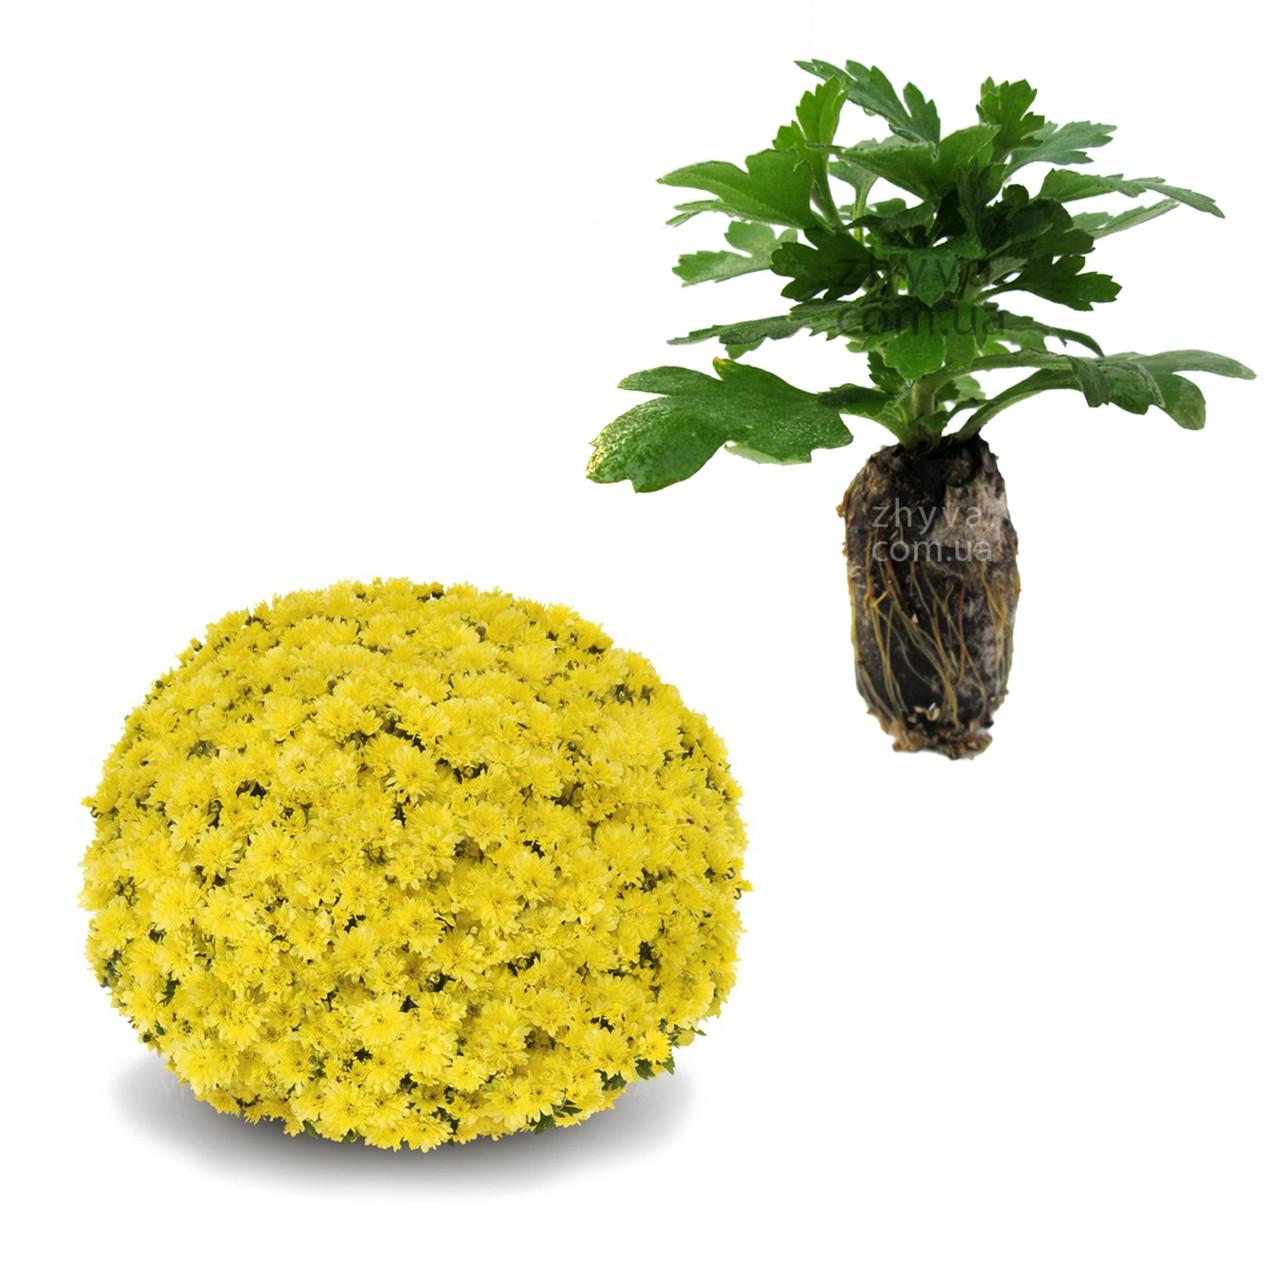 "Саджанці Хризантема Multiflora ""Arluno Yellow '' 1шт / Рассада Хризантема Multiflora ""Arluno Yellow''"